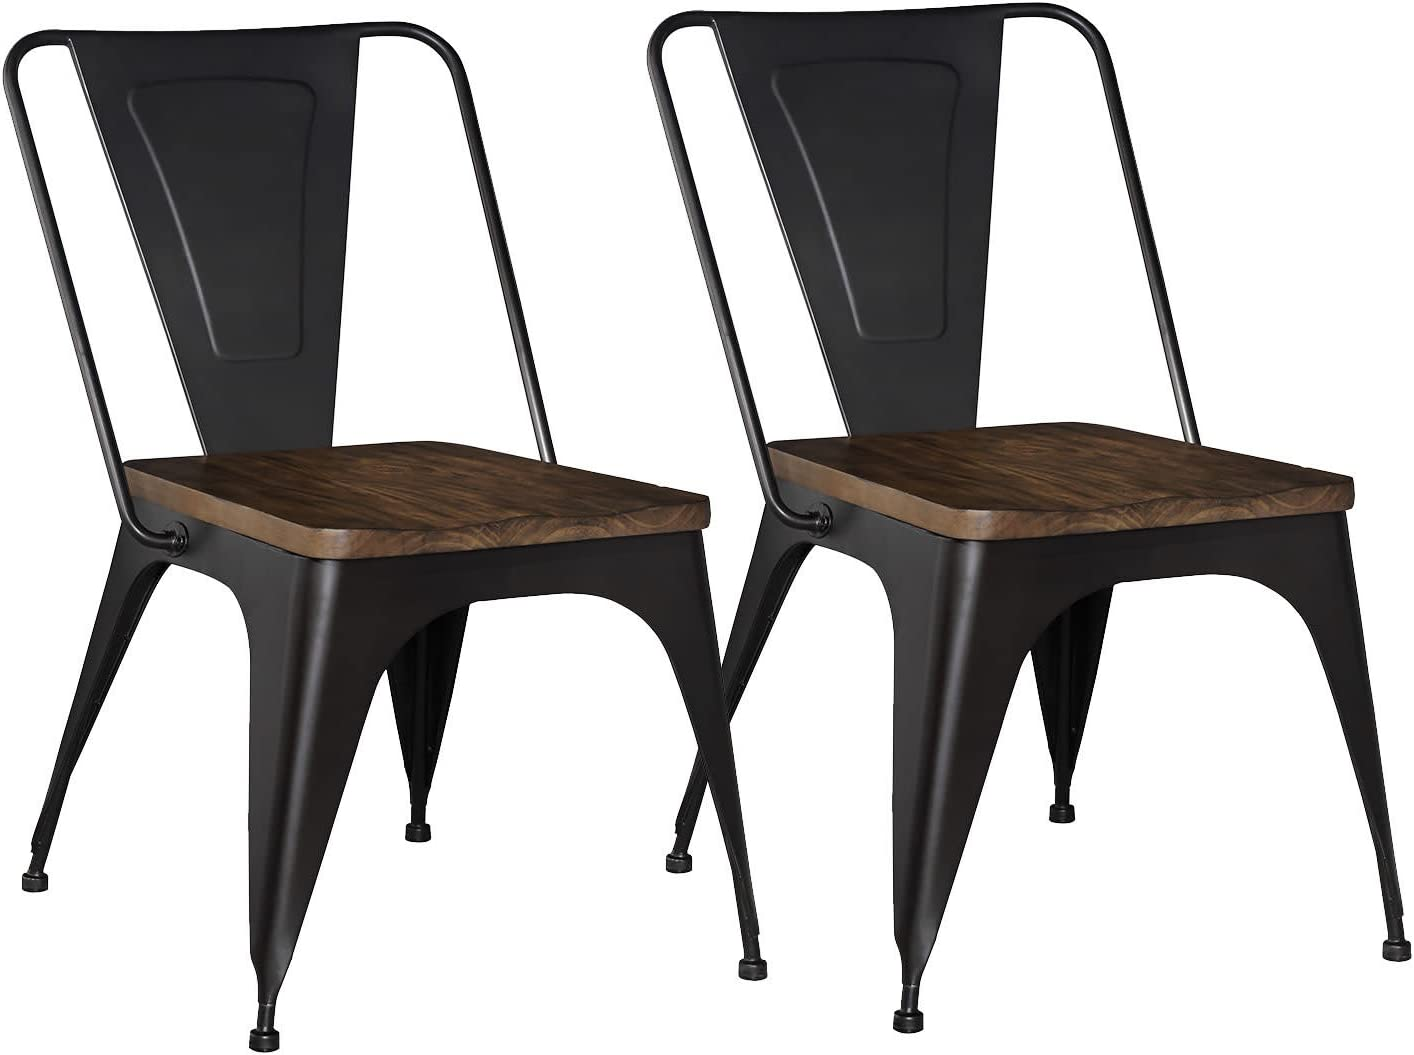 Standard Furniture Nelson 2-Pack Metal Chair, Black